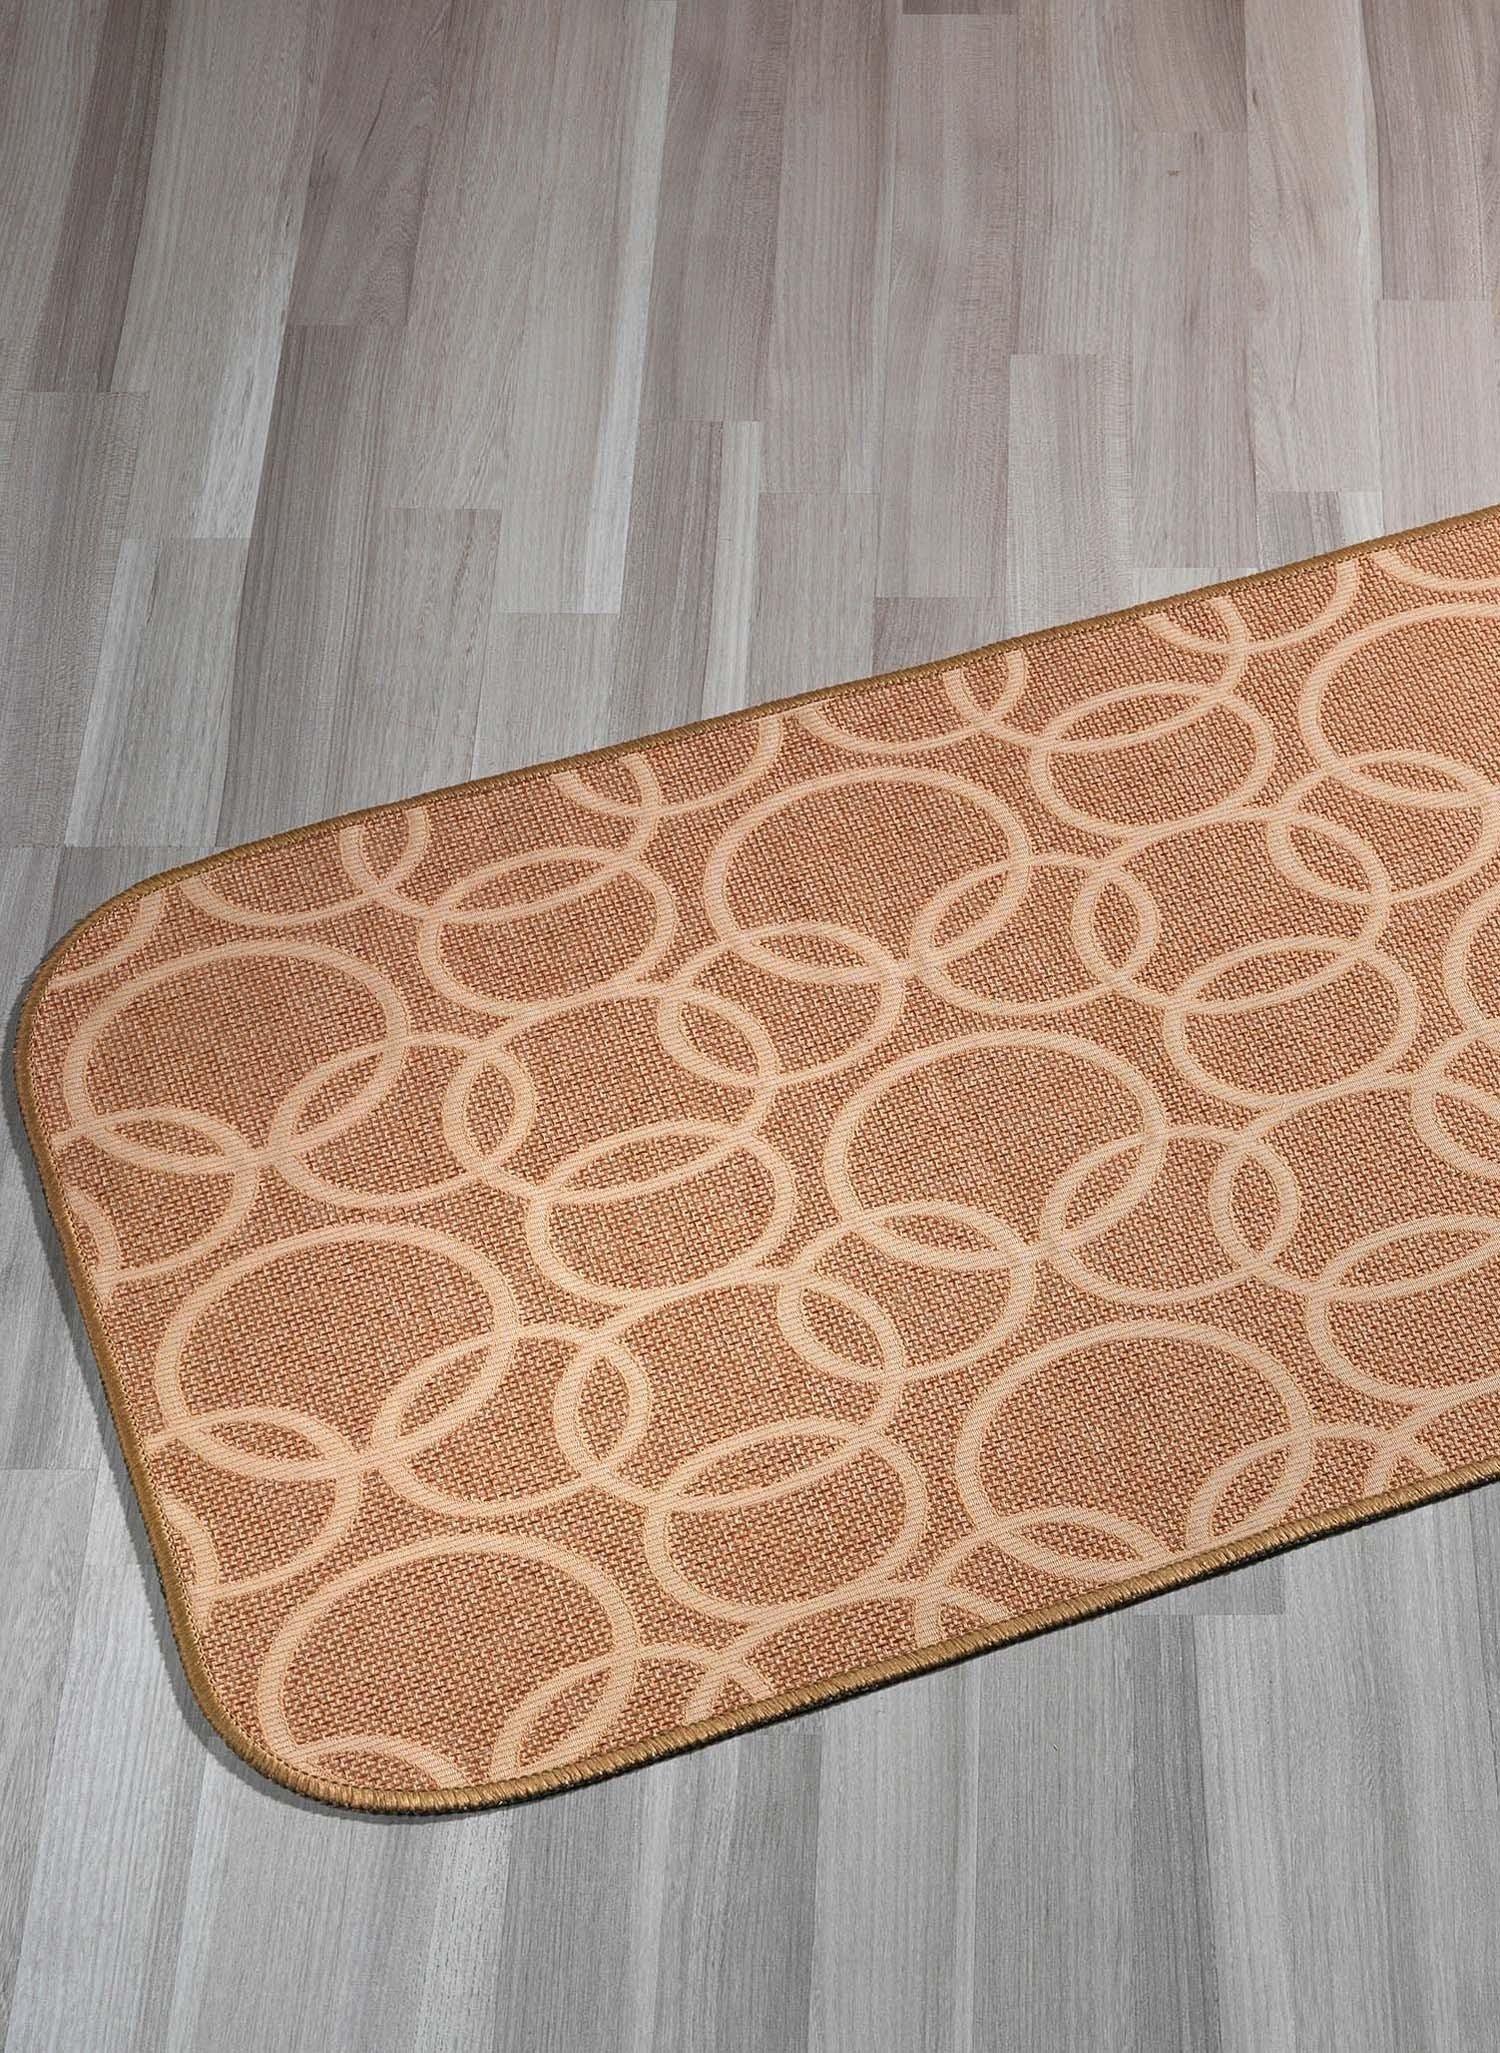 "Teppich""RINGE""beige 57x115 - 4 - Ronja.ch"